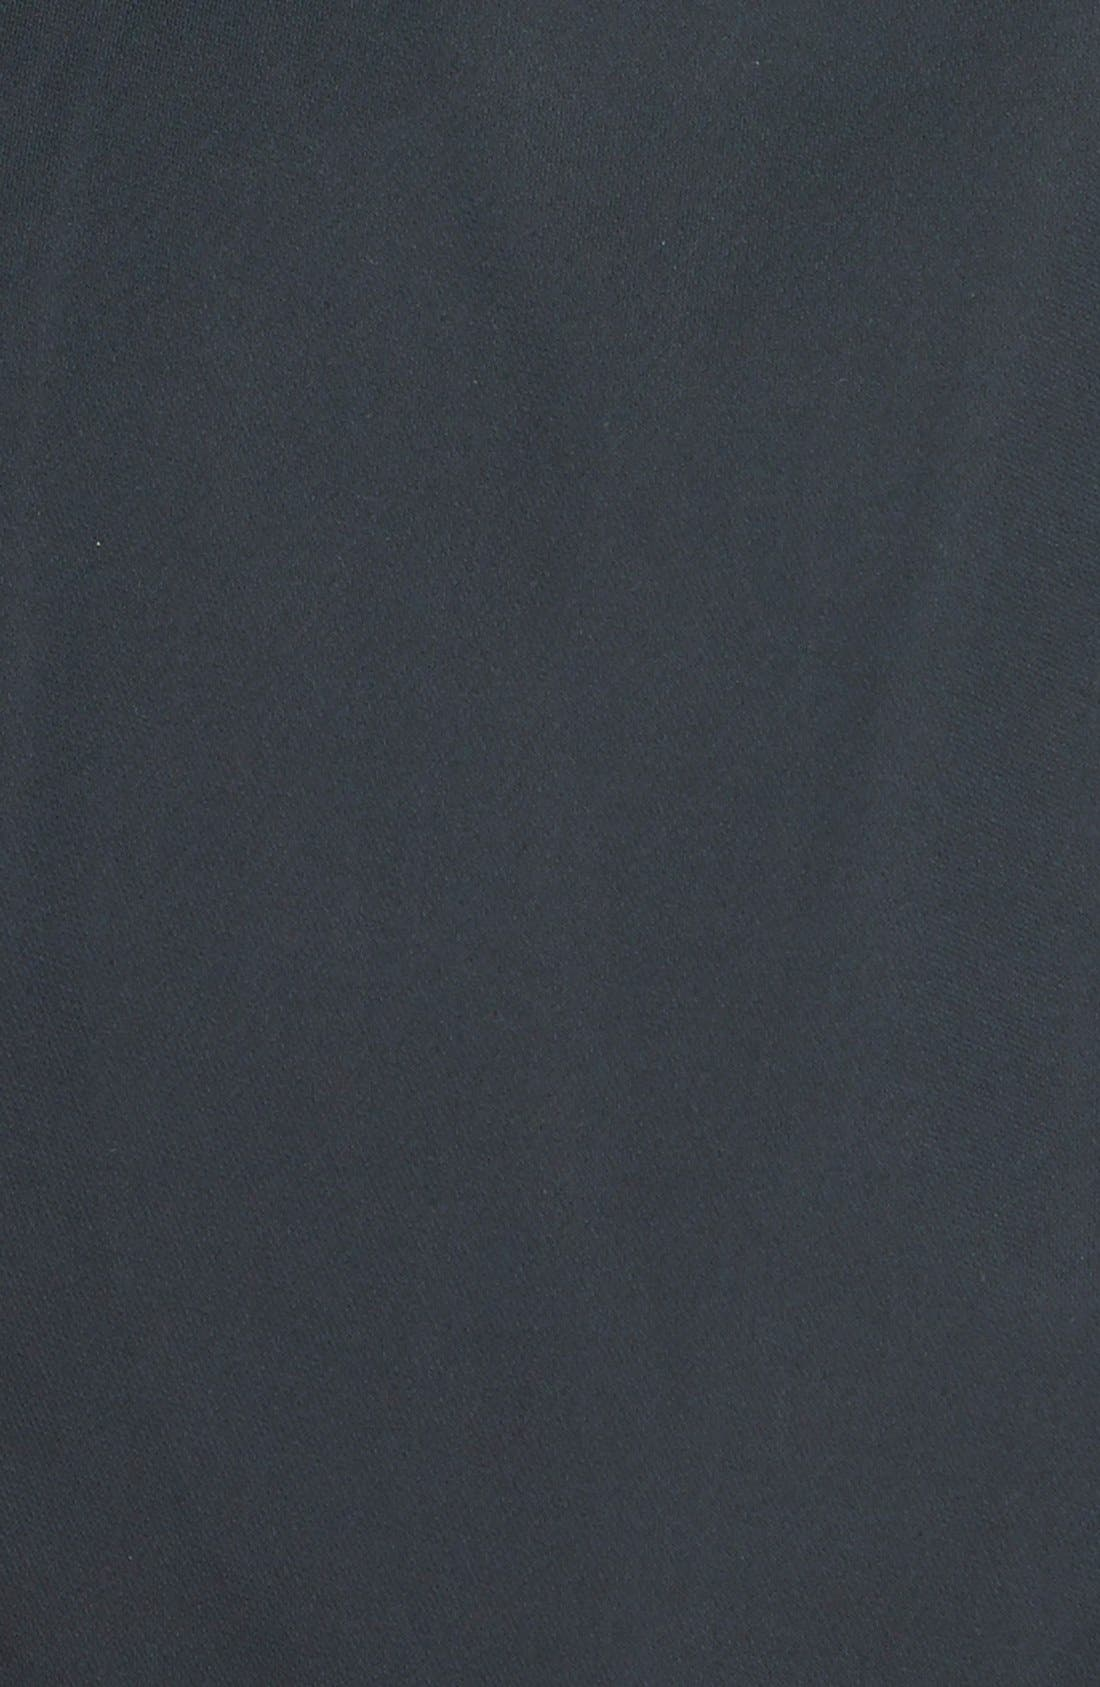 Cotton Blend Short Trench Coat,                             Alternate thumbnail 3, color,                             001